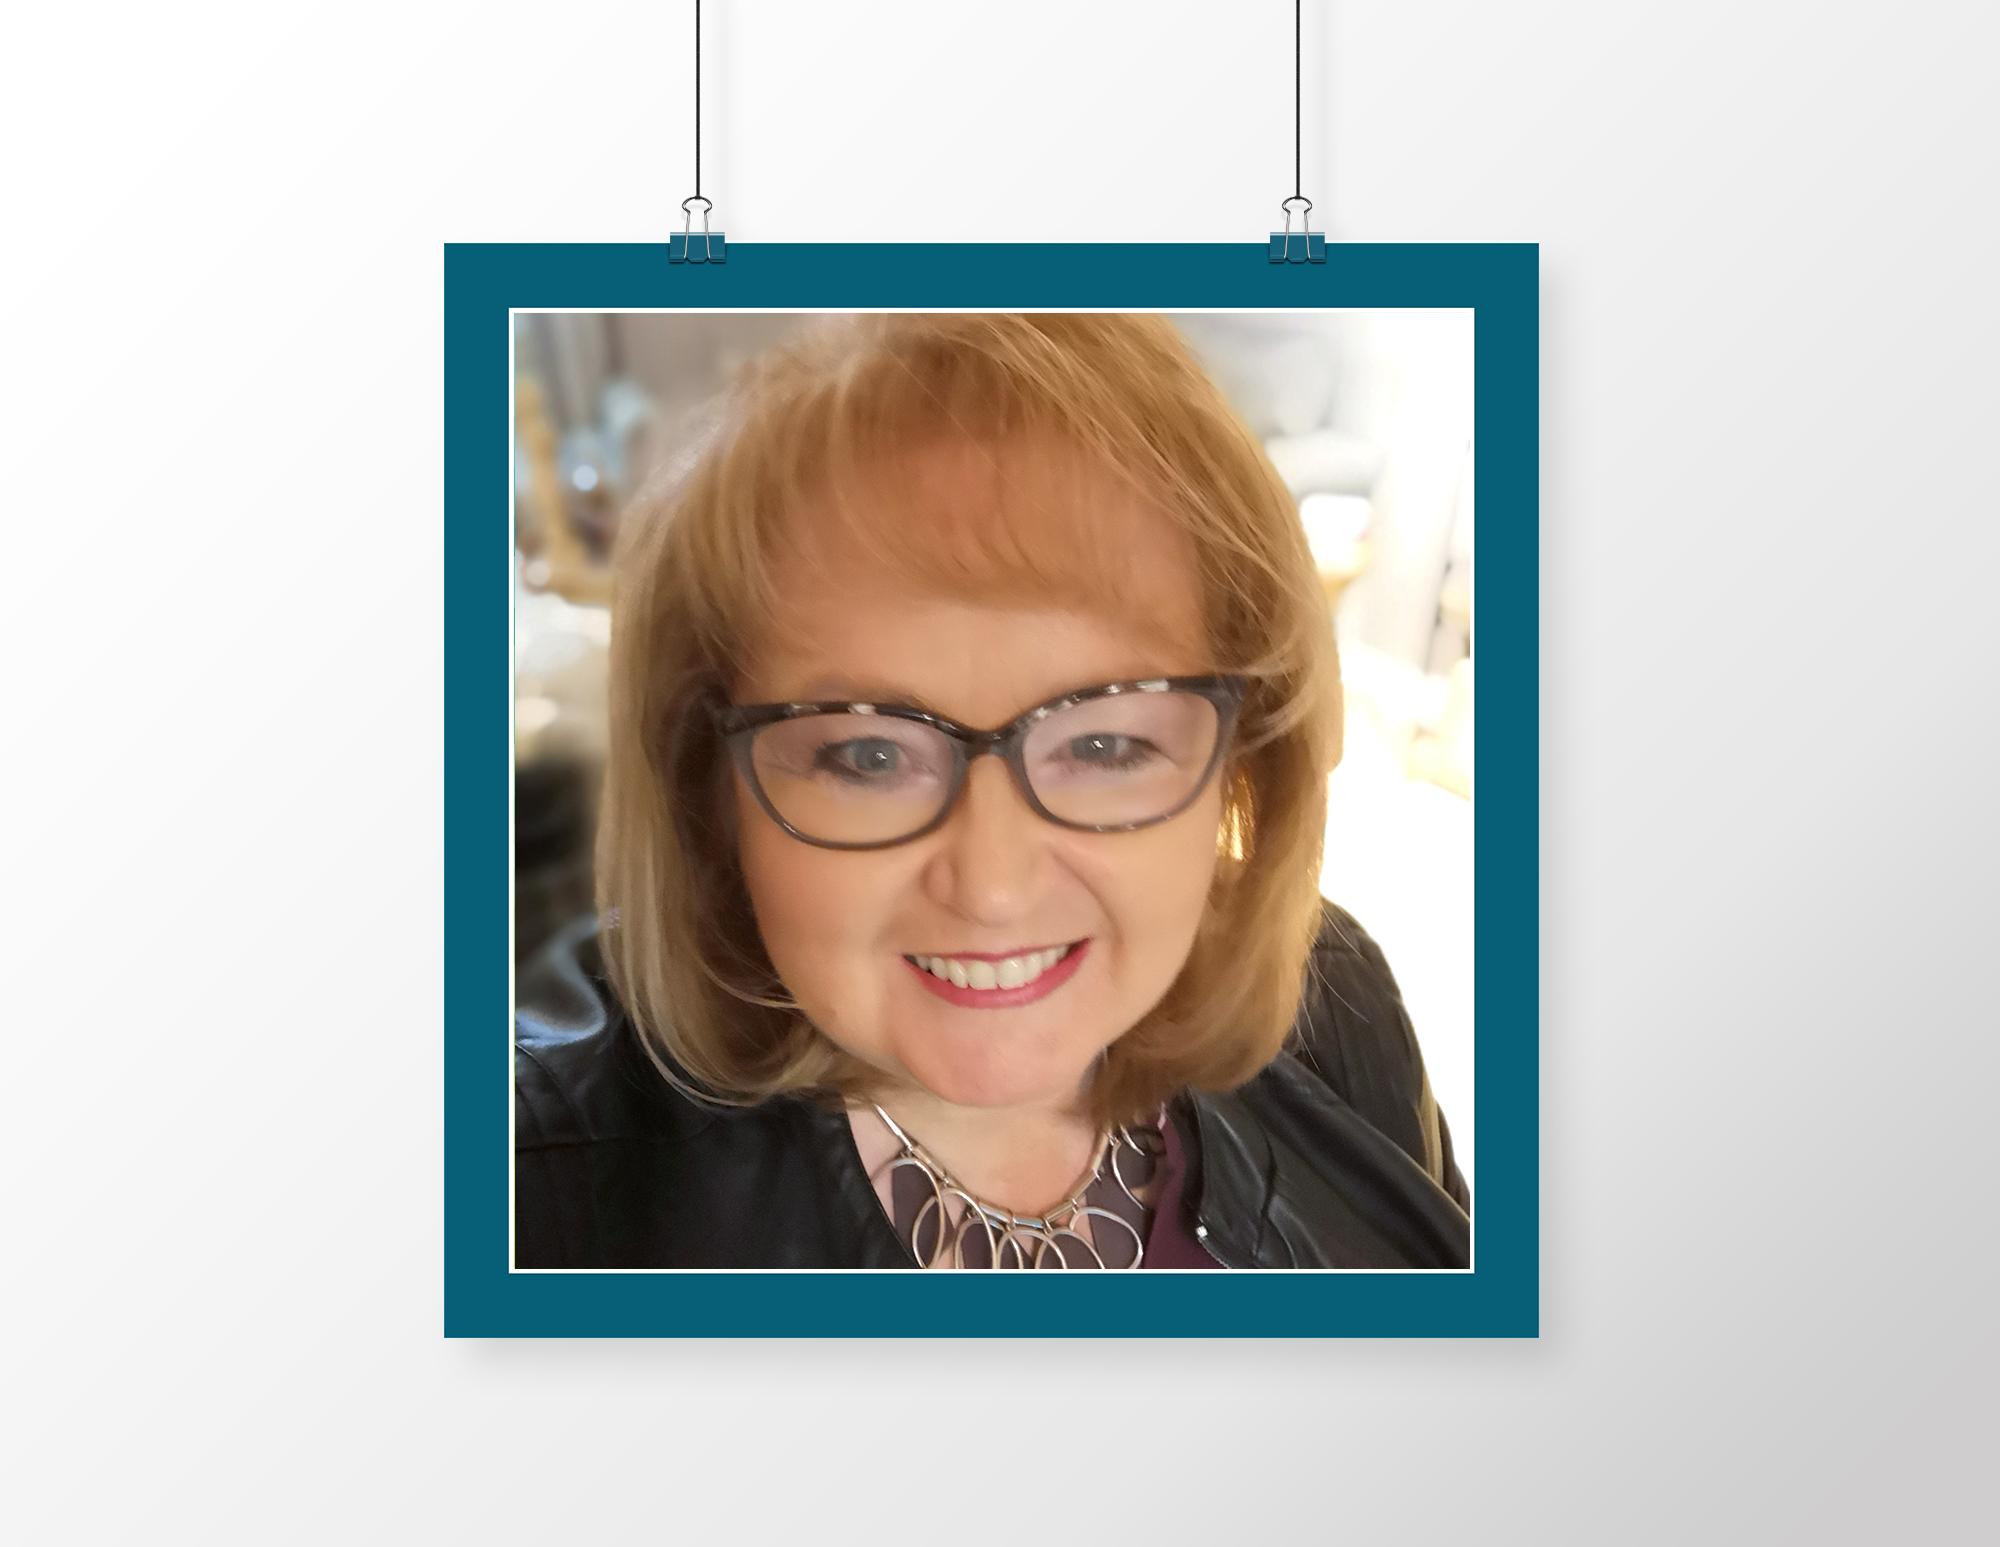 About Cheryl Parker